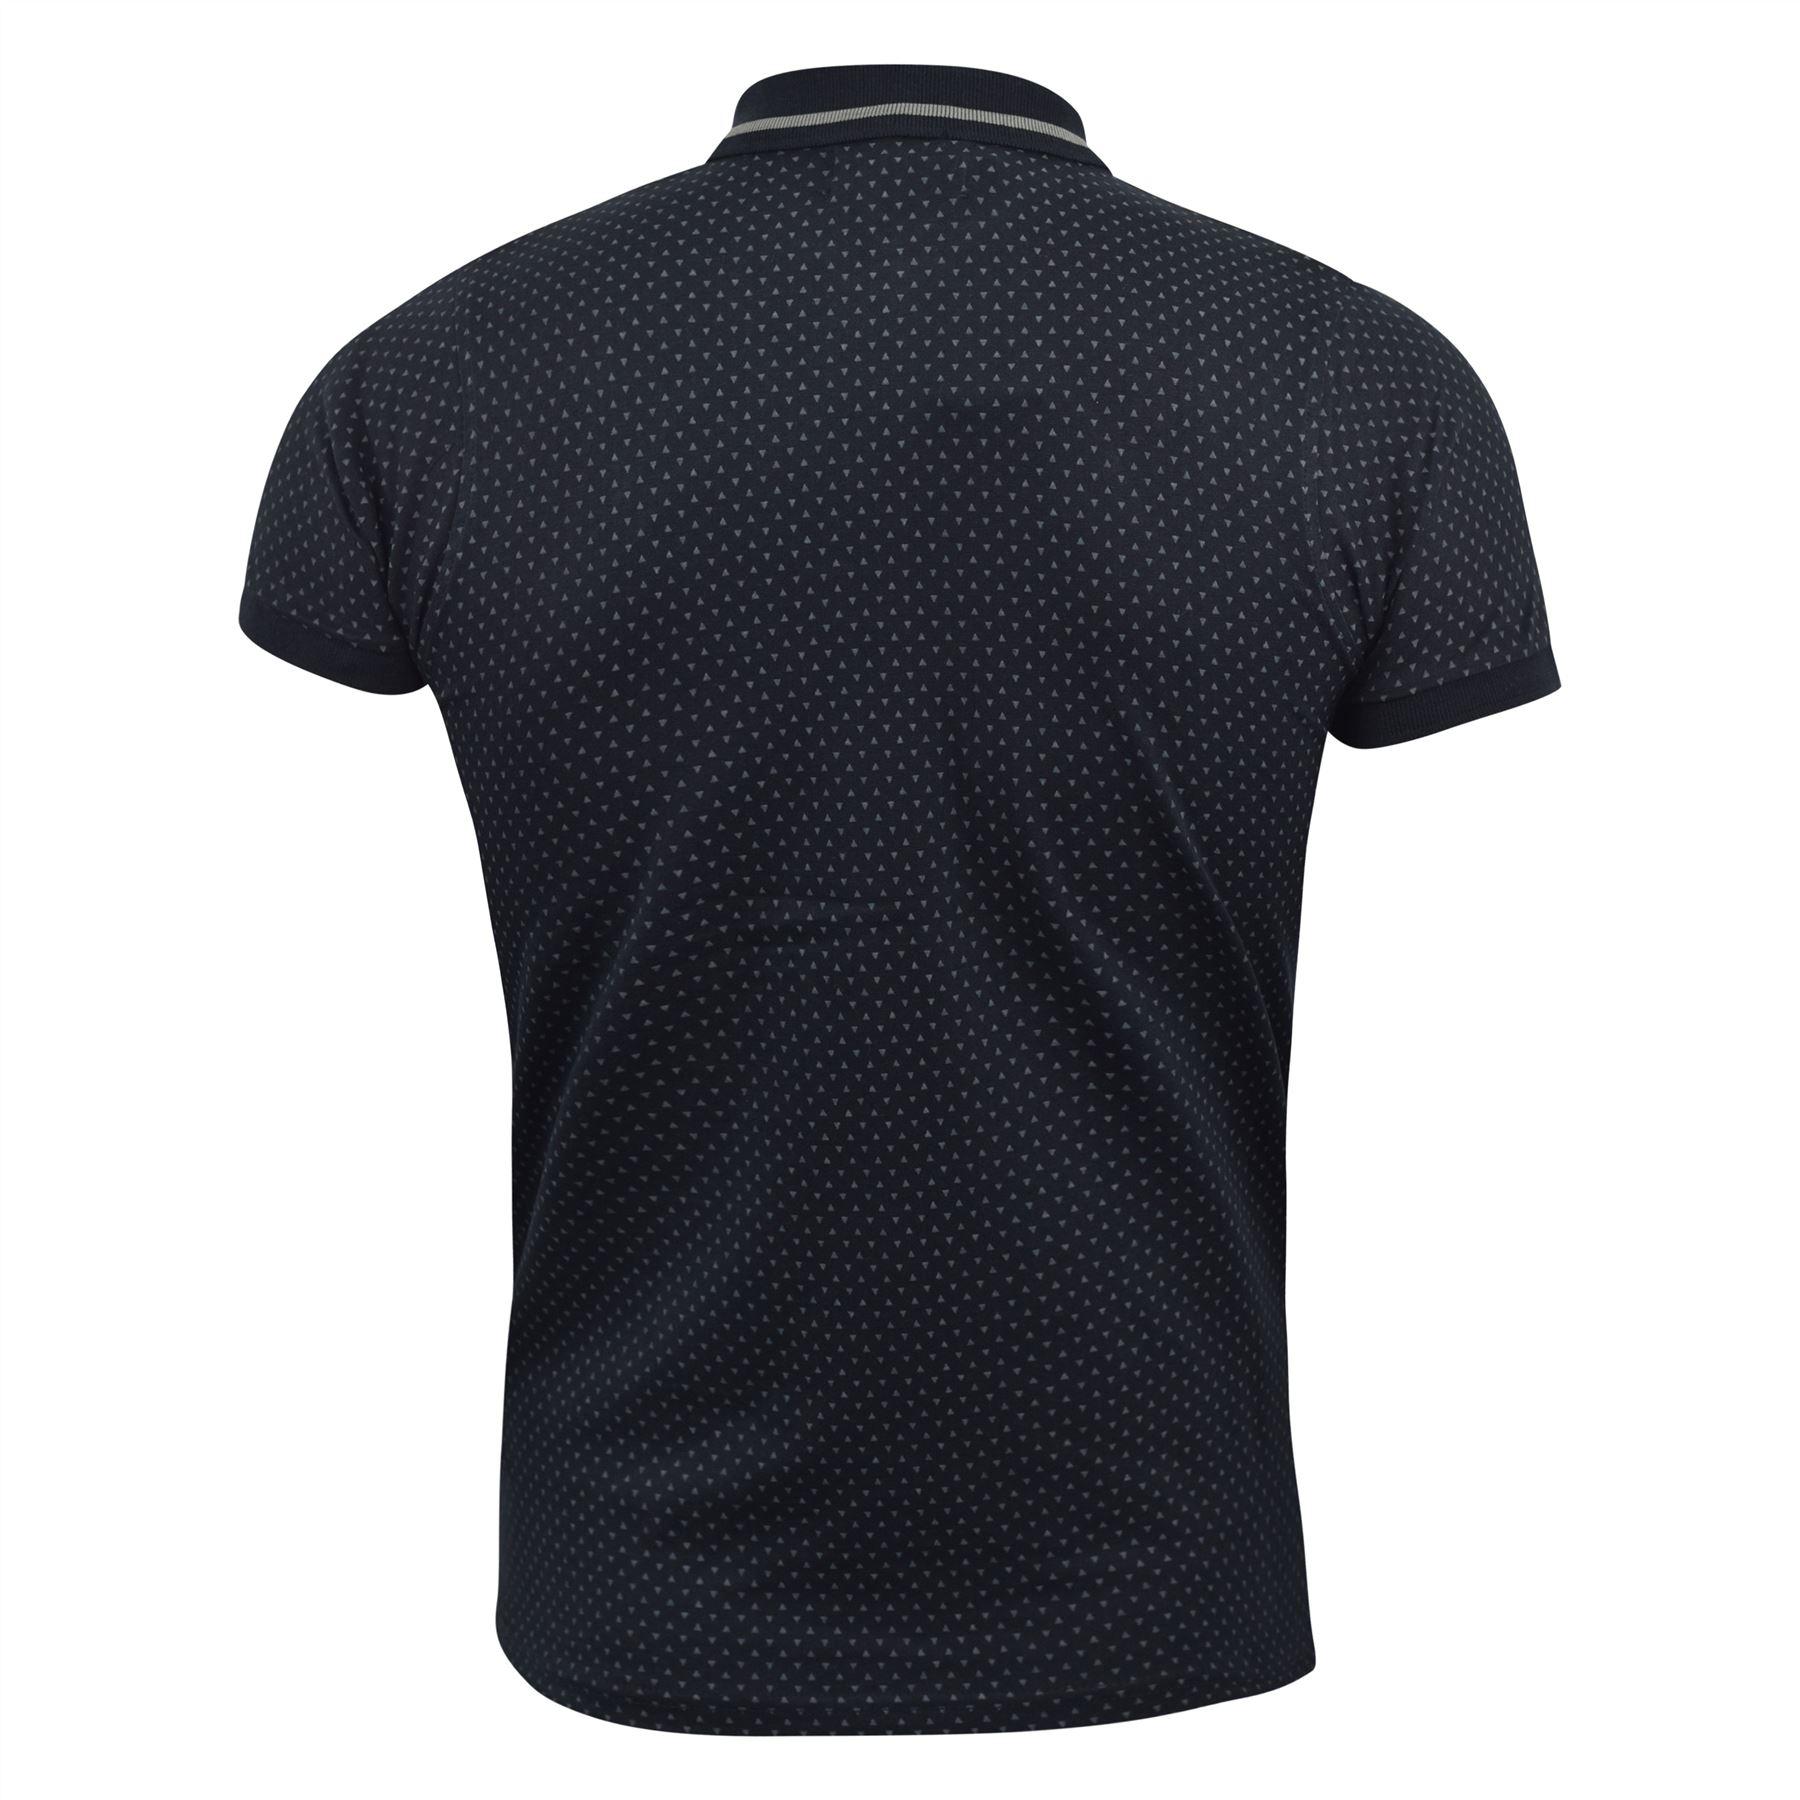 Mens-Polo-Shirt-kangol-Short-Sleeve-T-Shirt-Top-Saint thumbnail 3